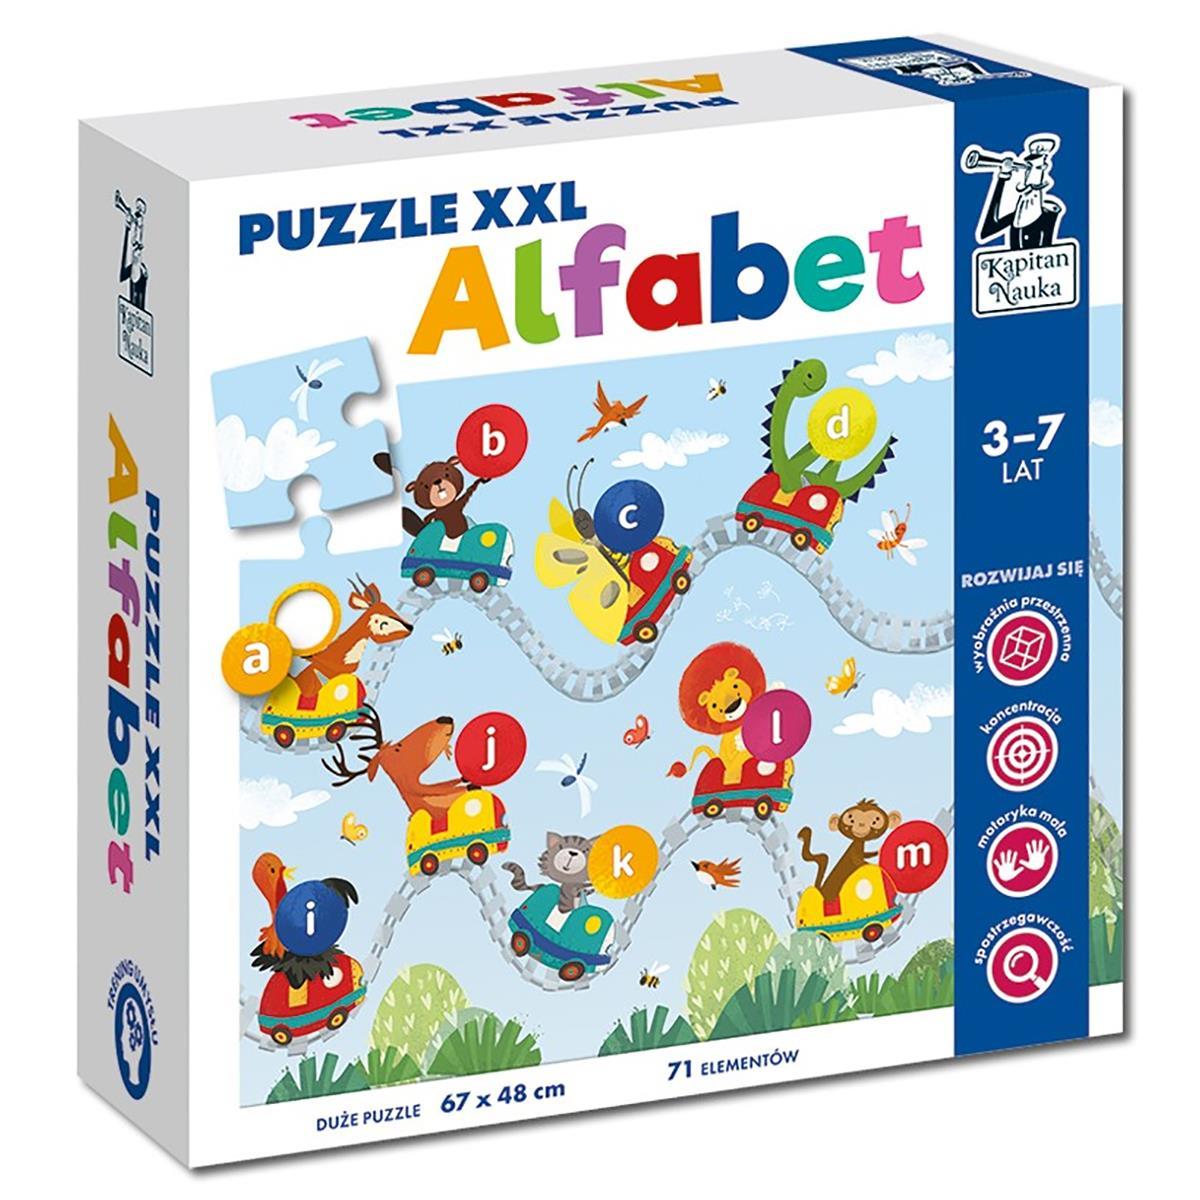 Puzzle XXL Alfabet, Kapitan Nauka